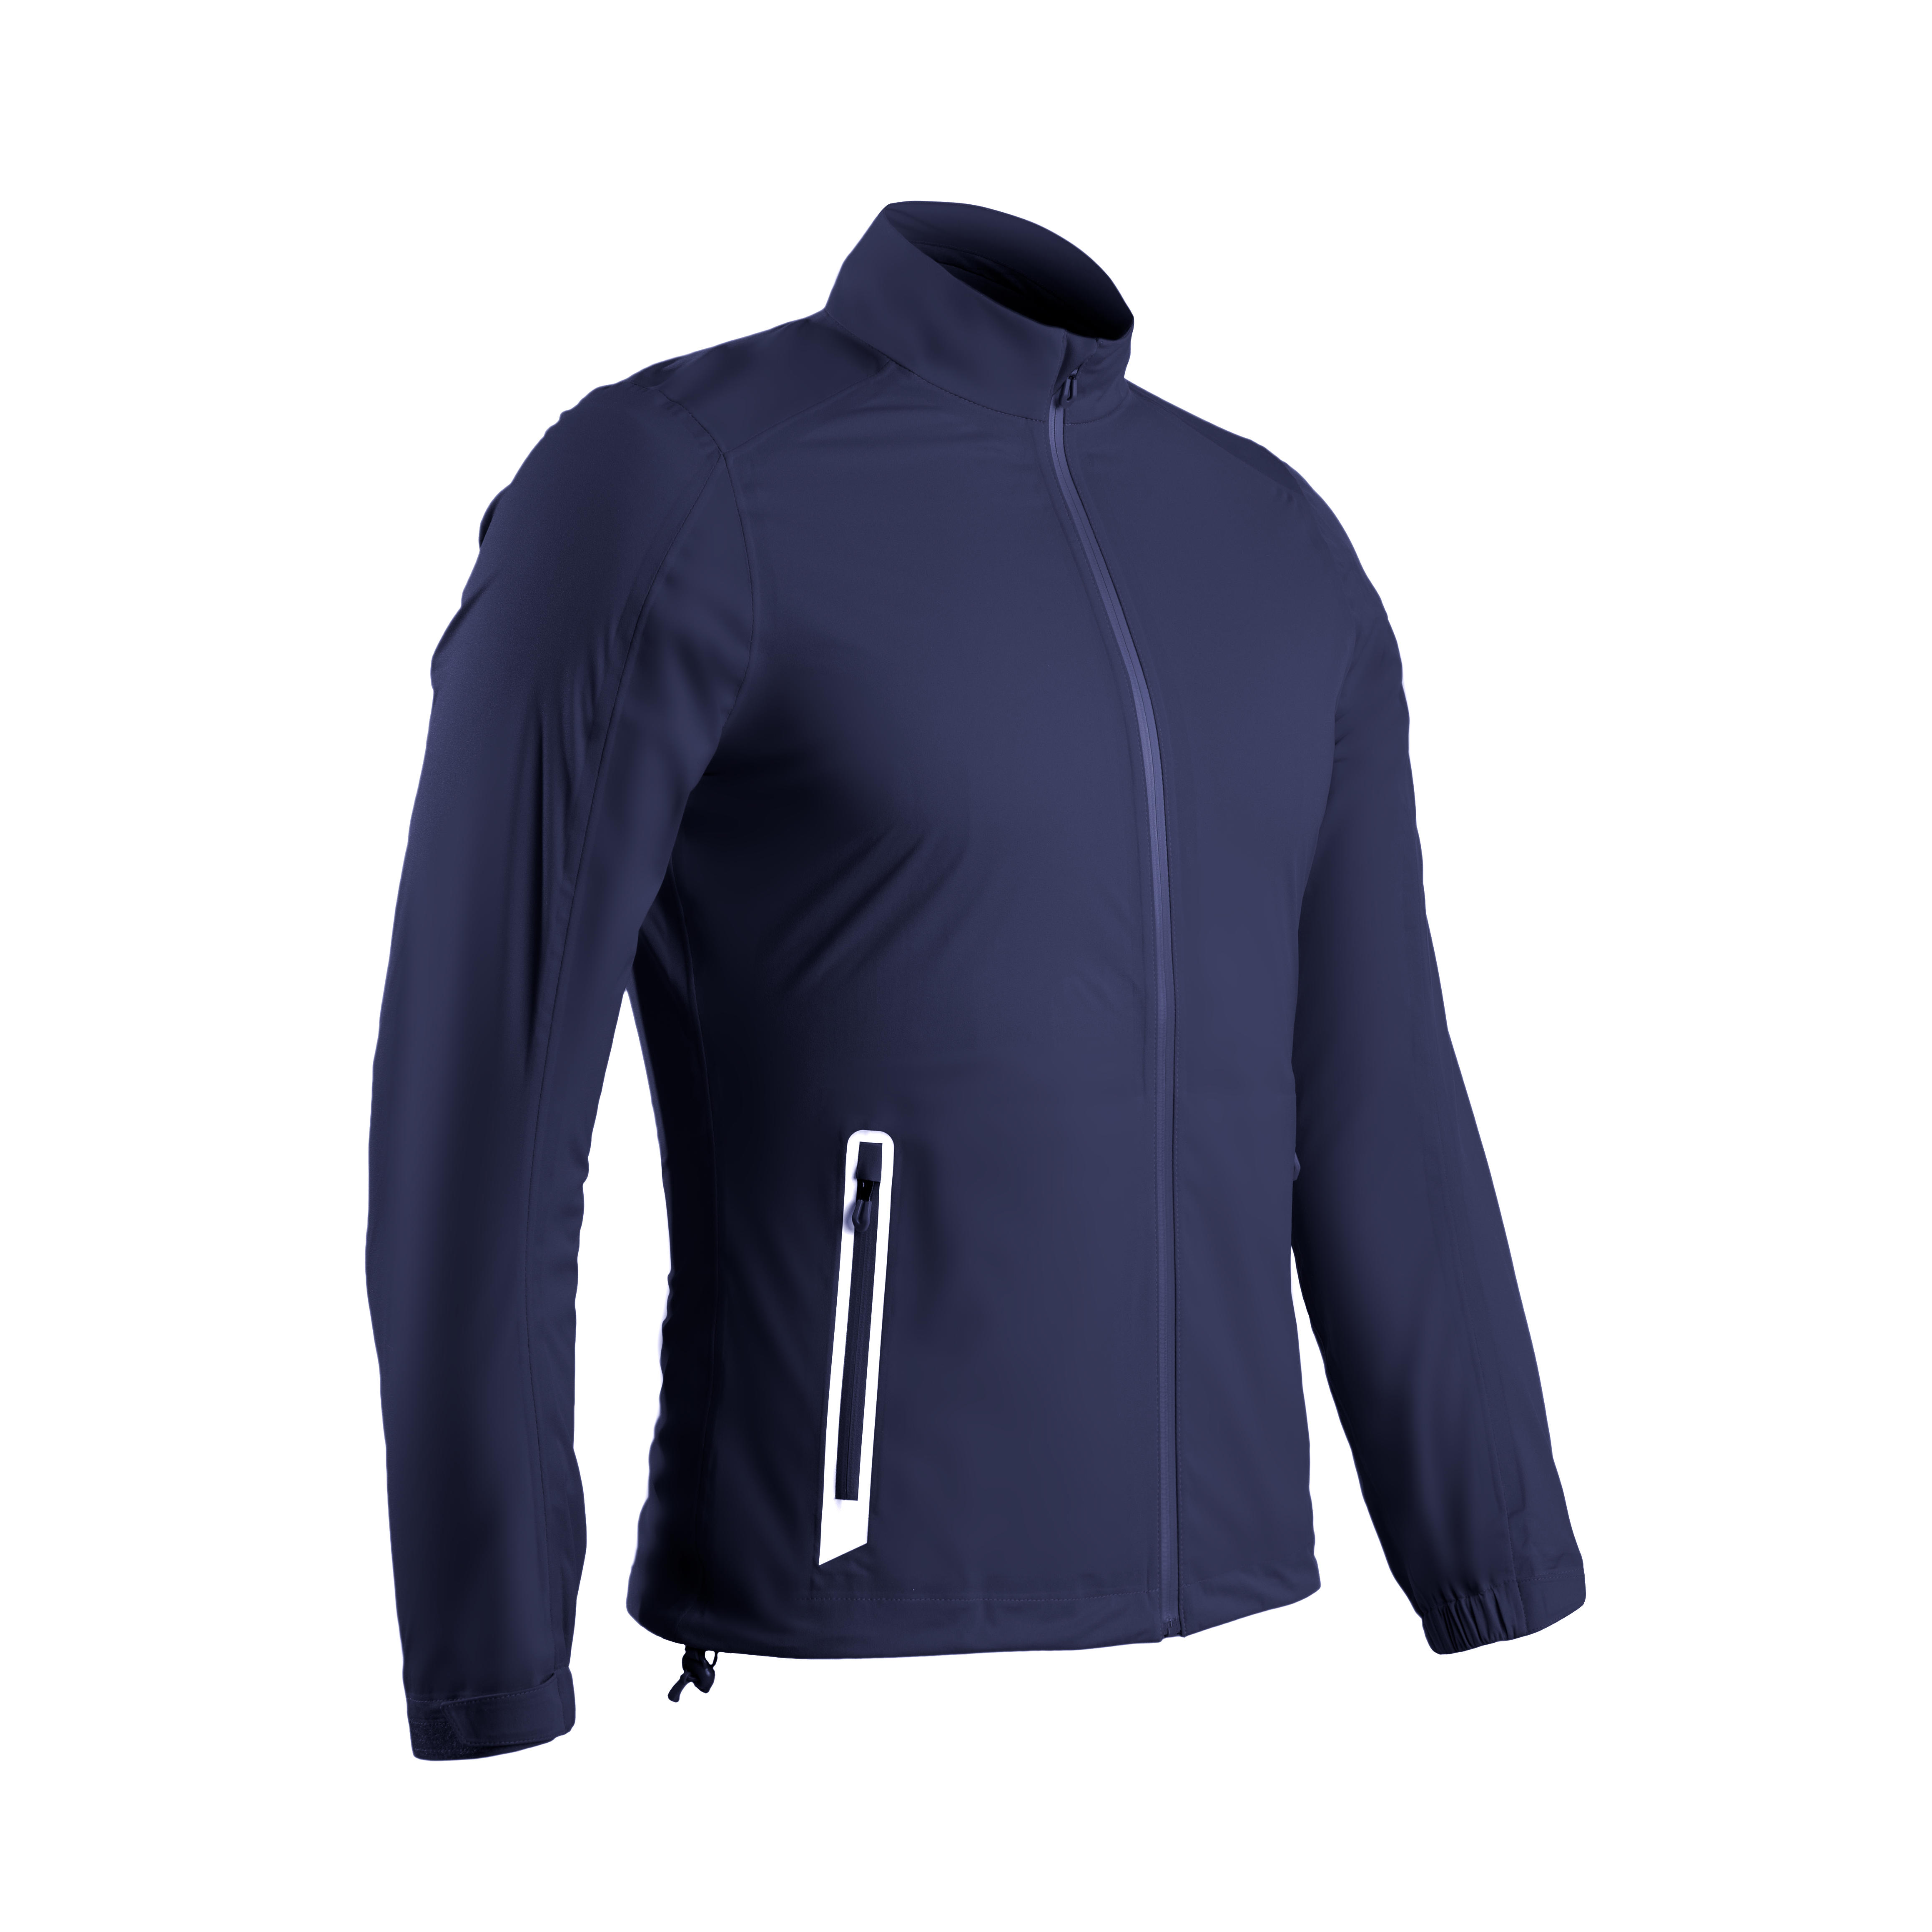 Jachetă Impermeabilă Golf la Reducere poza